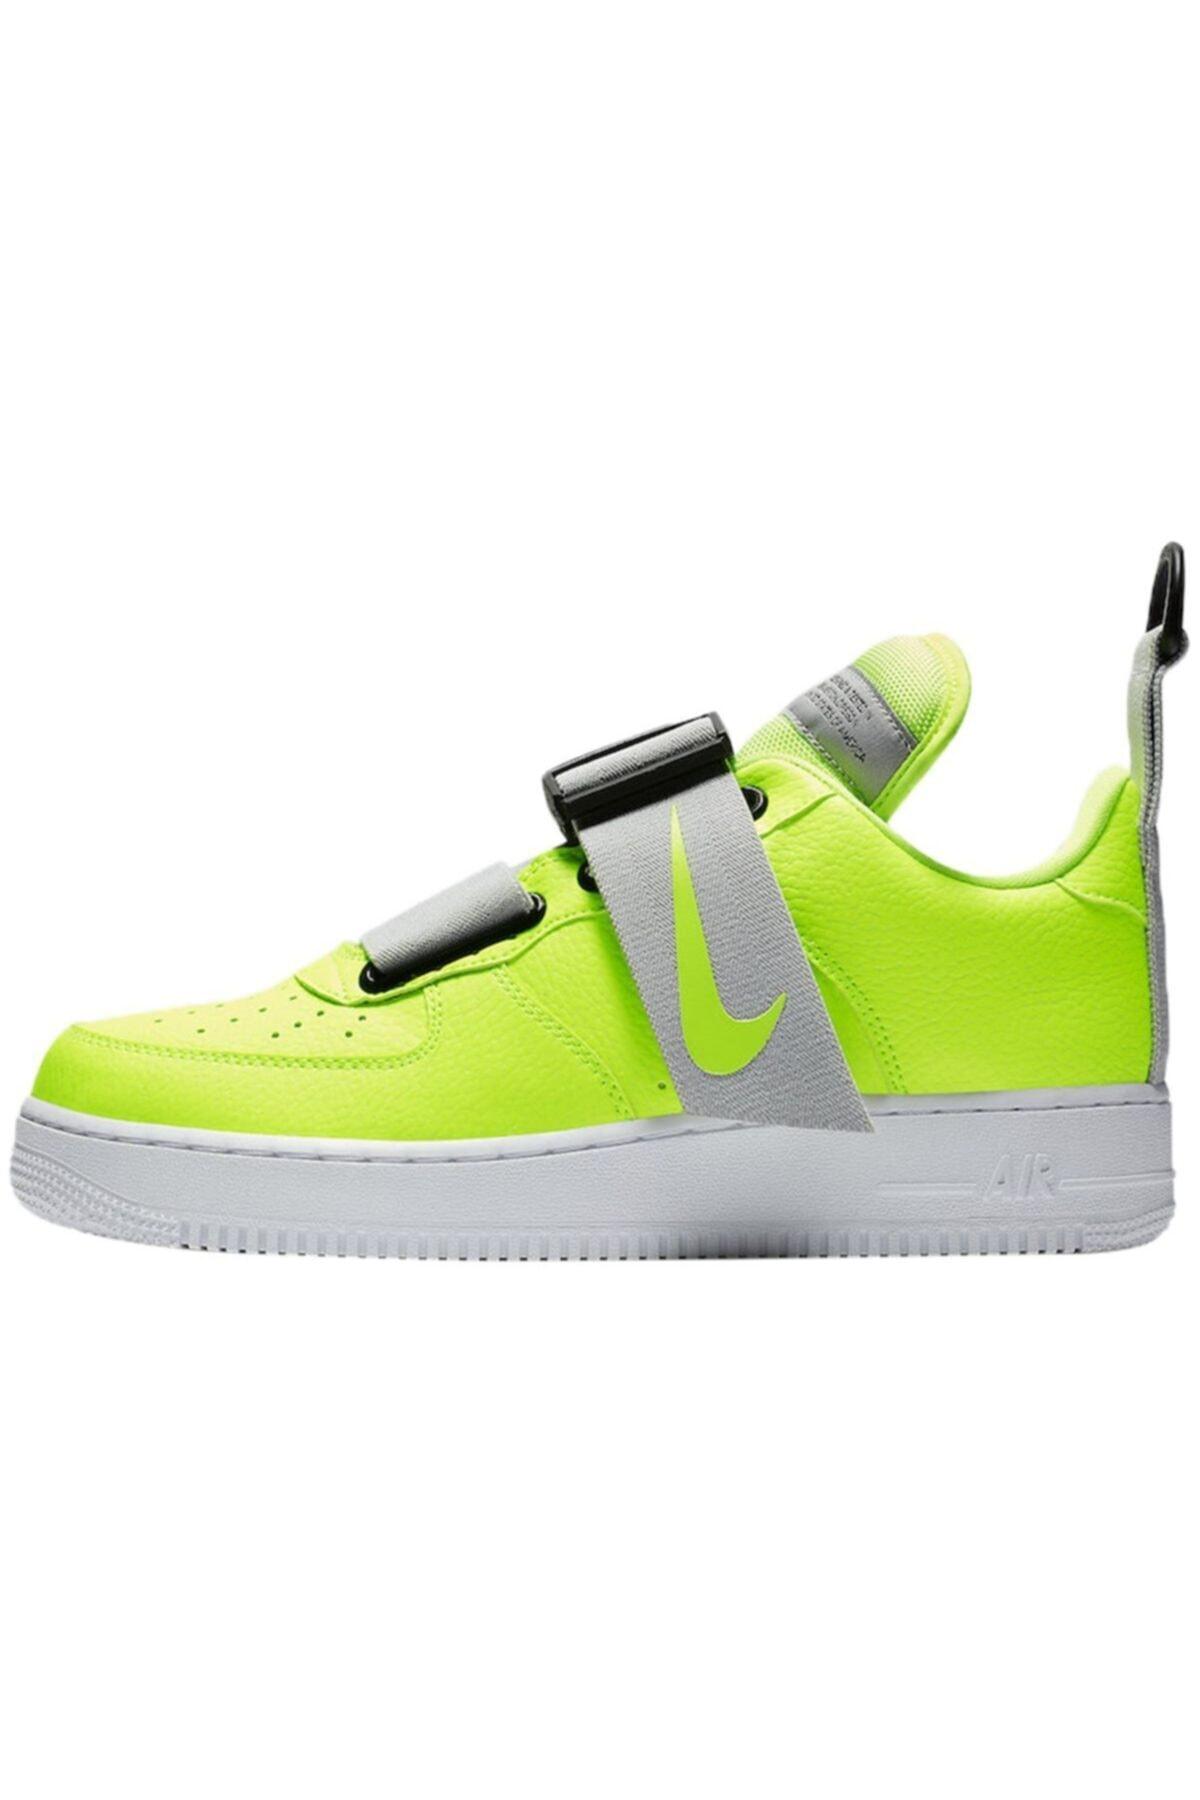 Nike Unisex Spor Ayakkabı Air Force 1 Utility Volt Ao1531-700 1